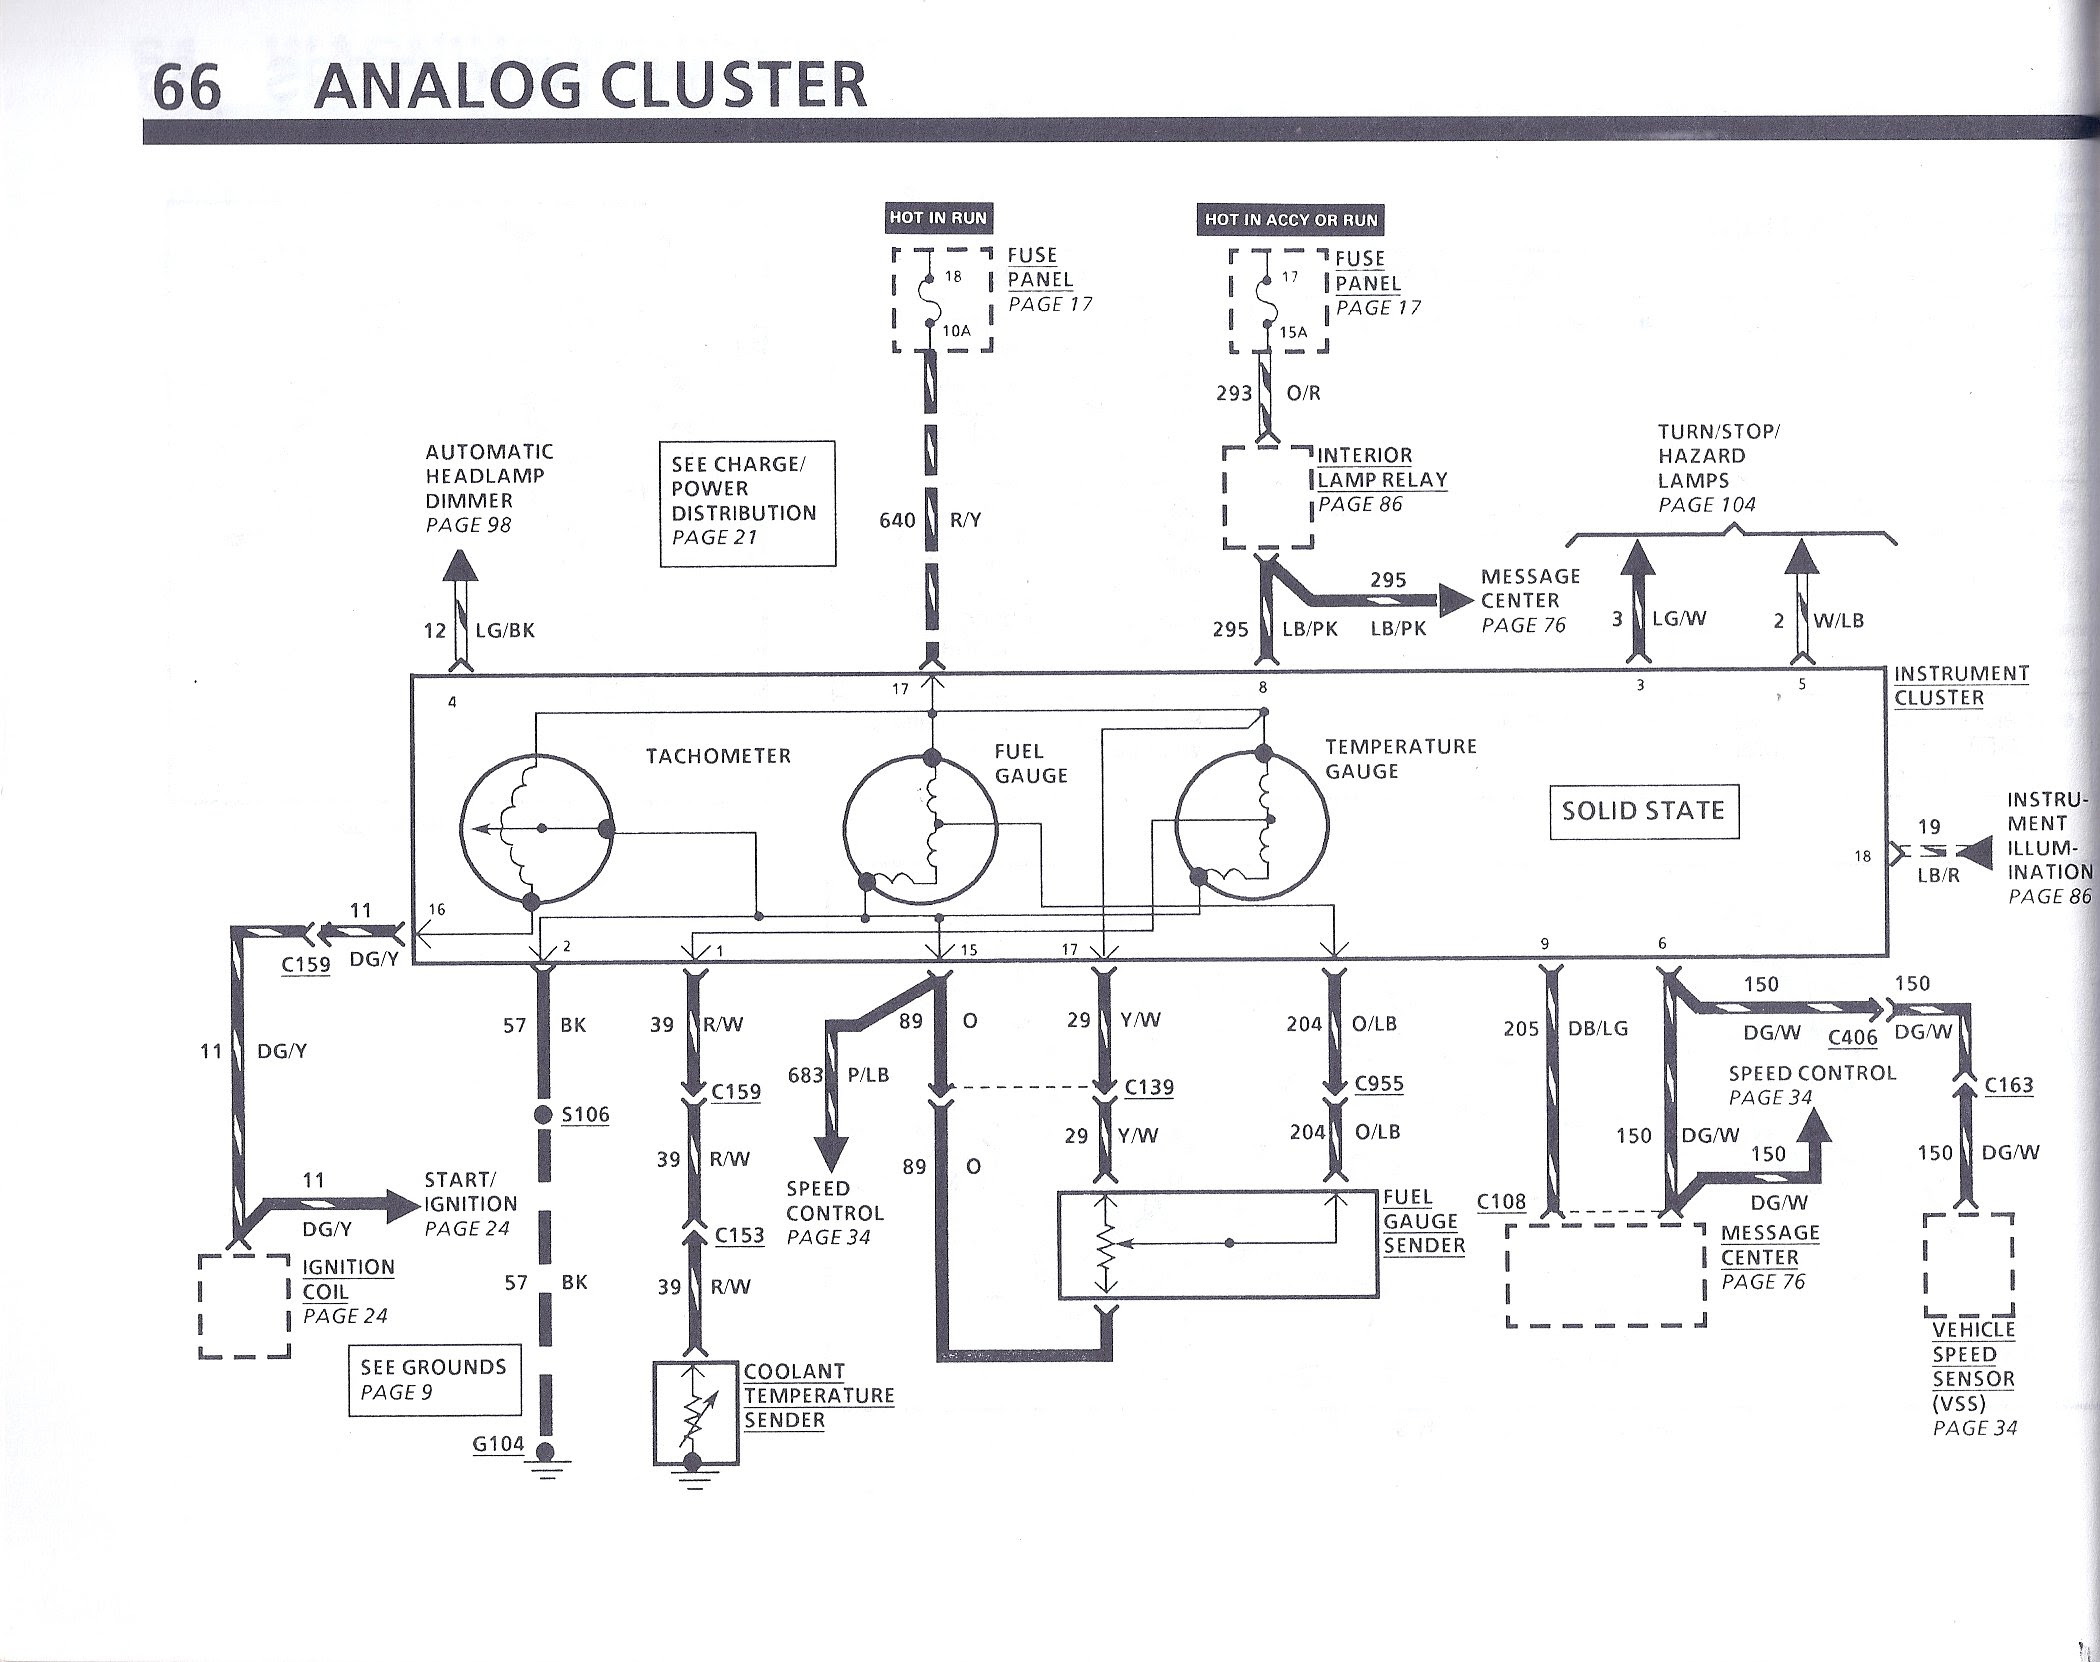 Diagram Jaguar Mark 7 Wiring Diagrams Full Version Hd Quality Wiring Diagrams Eschematics2f Angelux It